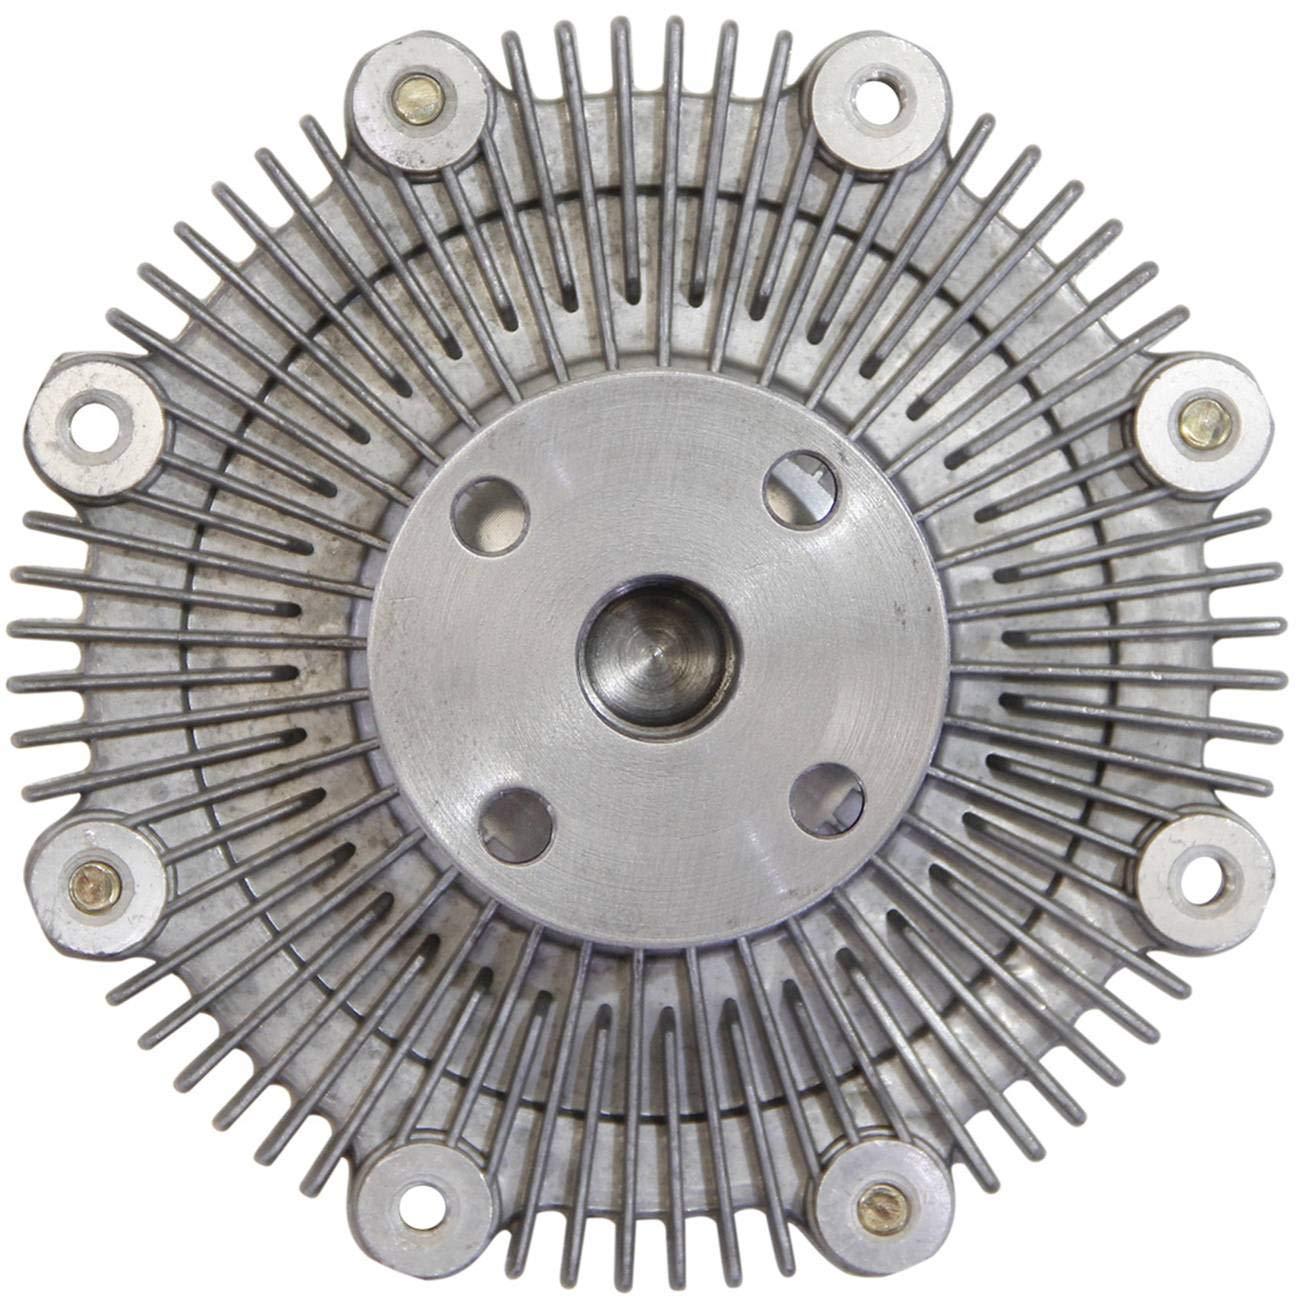 Amazon.com: TOPAZ MD104576 Engine Cooling Fan Clutch for Mitsubishi: Automotive